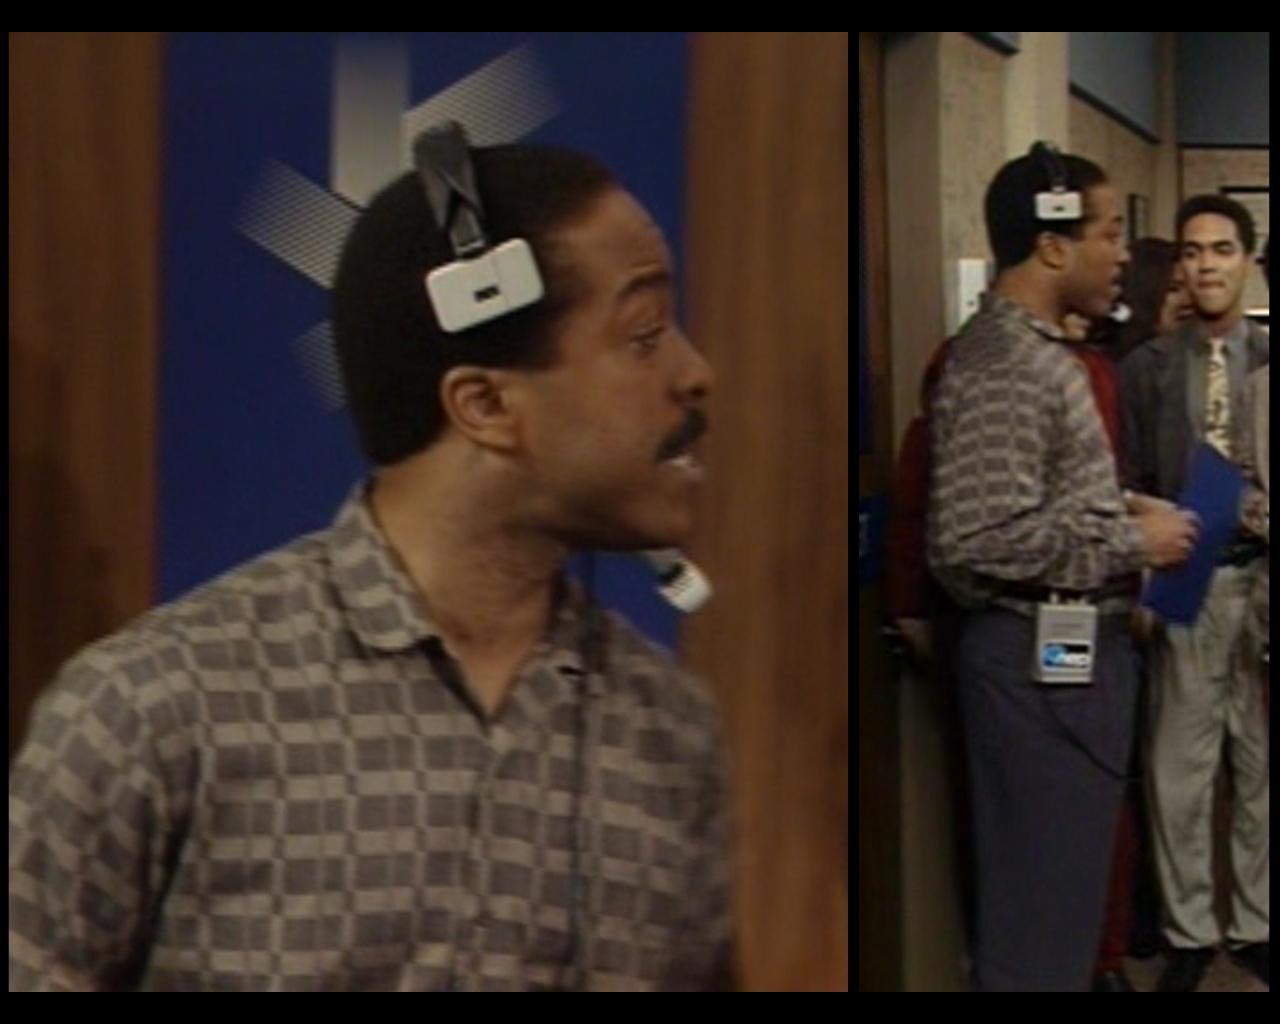 Adam Sandler Cosby Show huxtable hotness: season 4, episode 10: dance mania